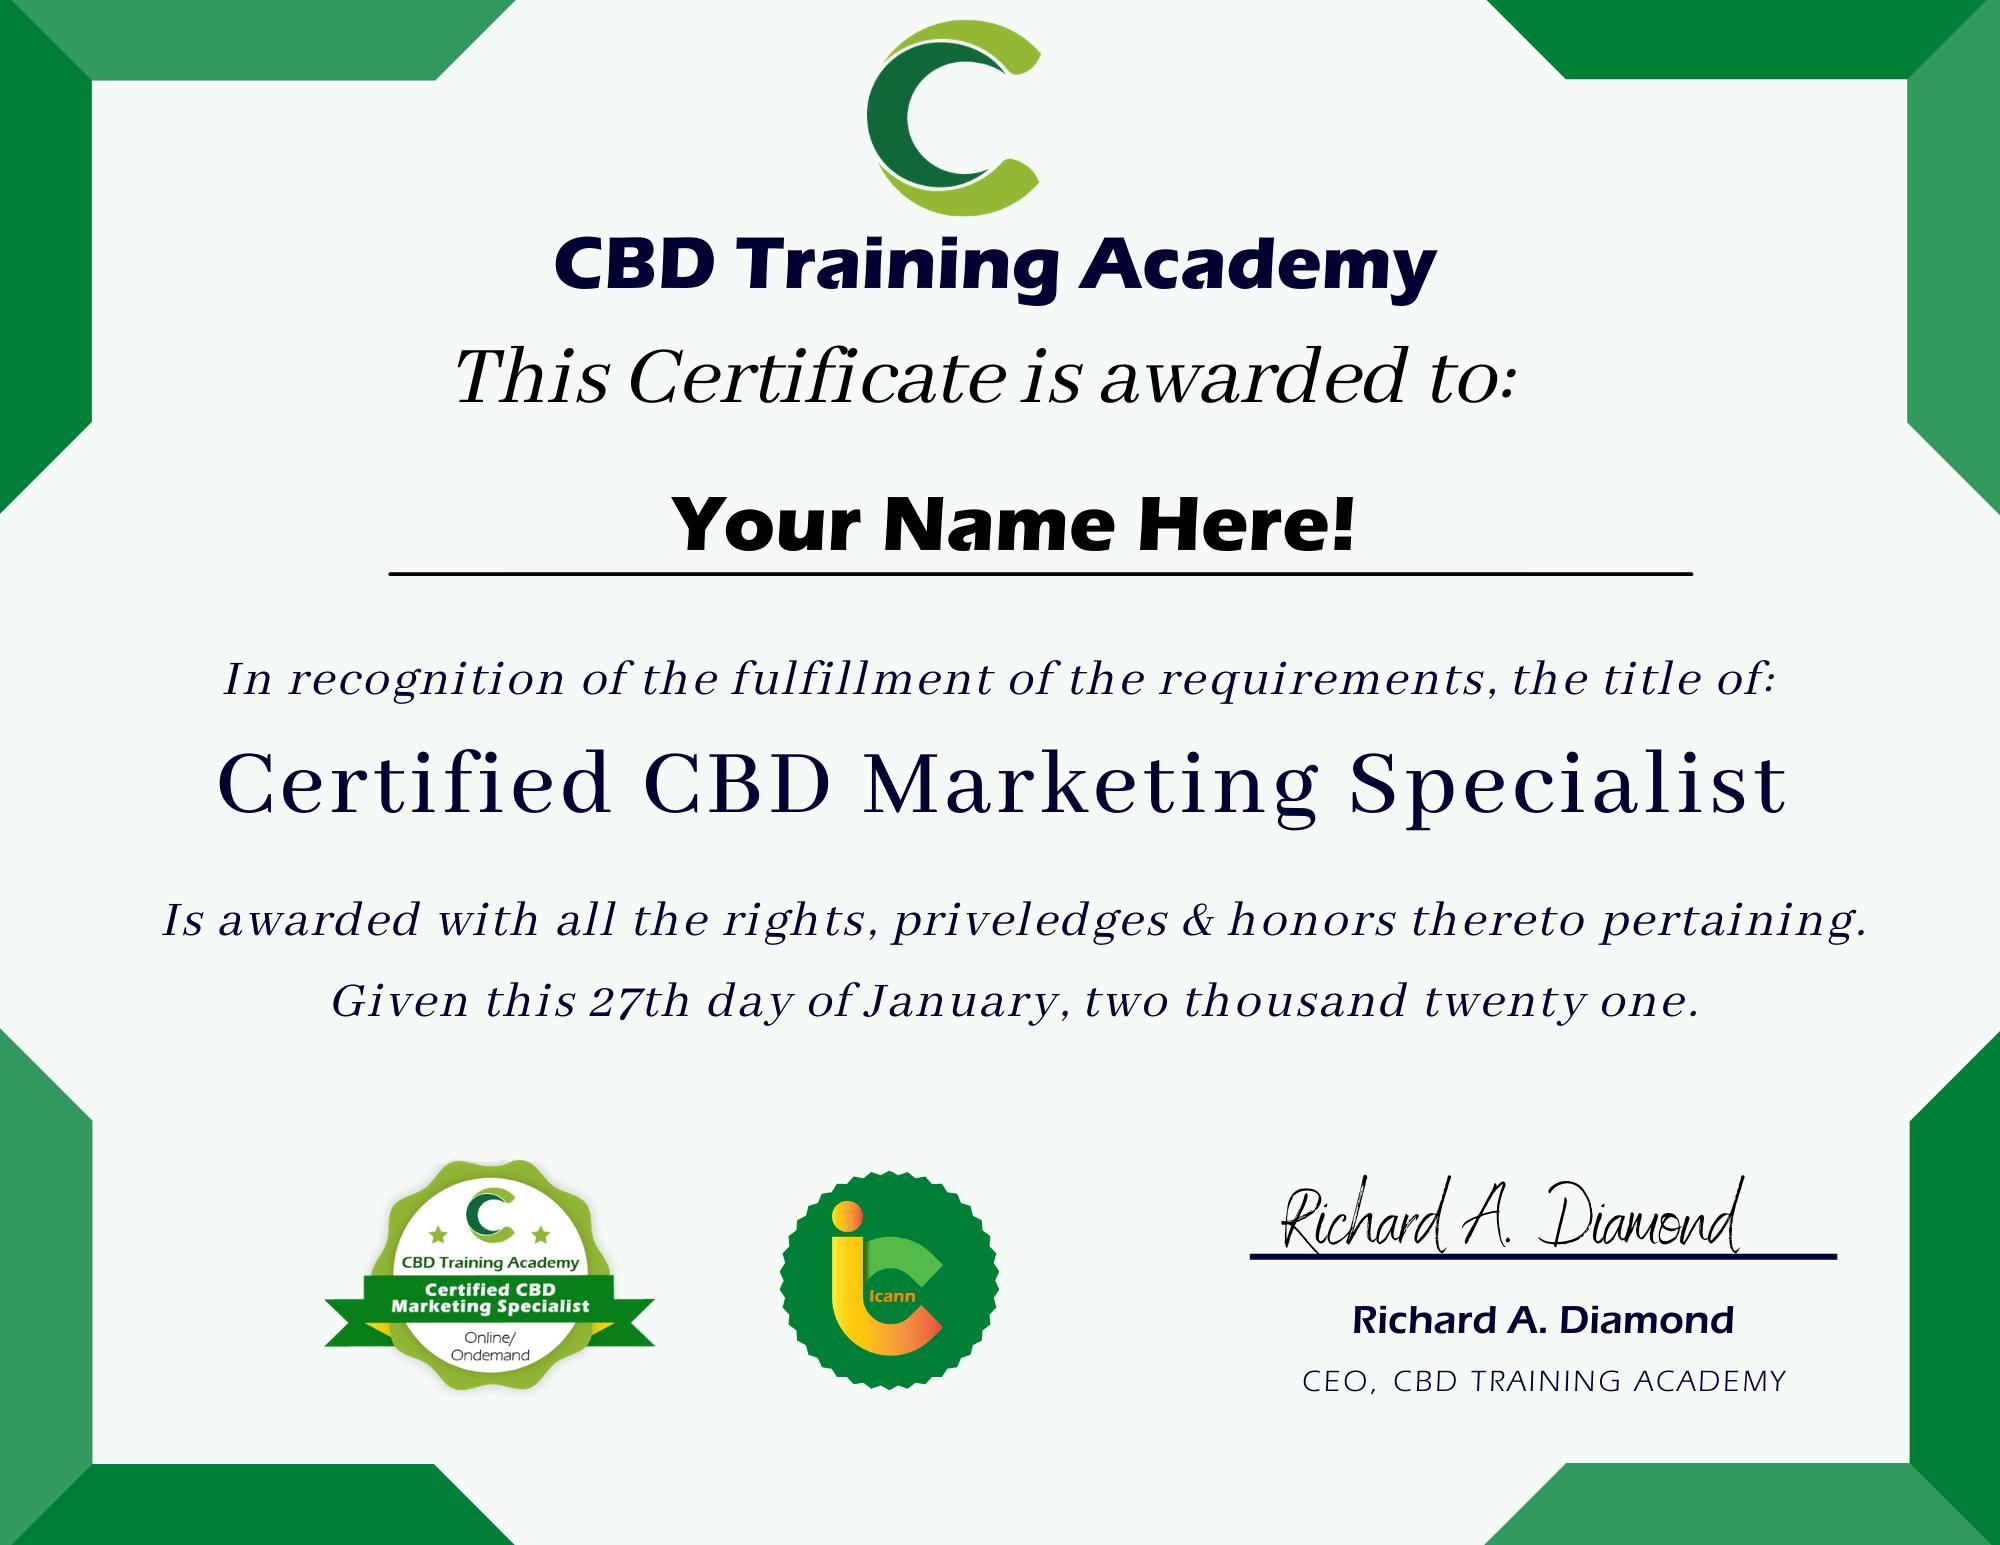 CBD Training Academy Certification